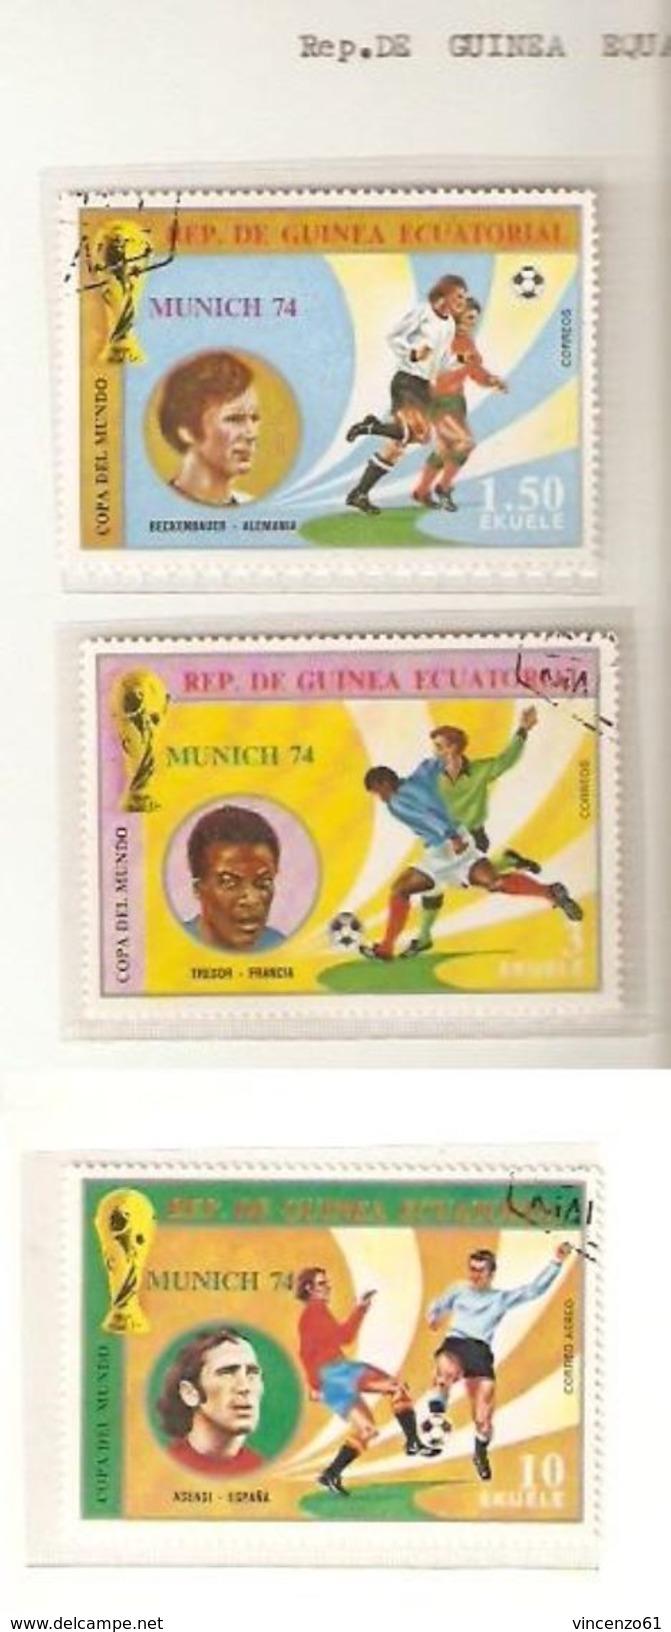 REPUBLIQUE DE GUINNEA ECUATORIAL VOLTA BURKINA FASO   FIFA WORLD CUP 1974 GERMANY 1974 - Coppa Del Mondo